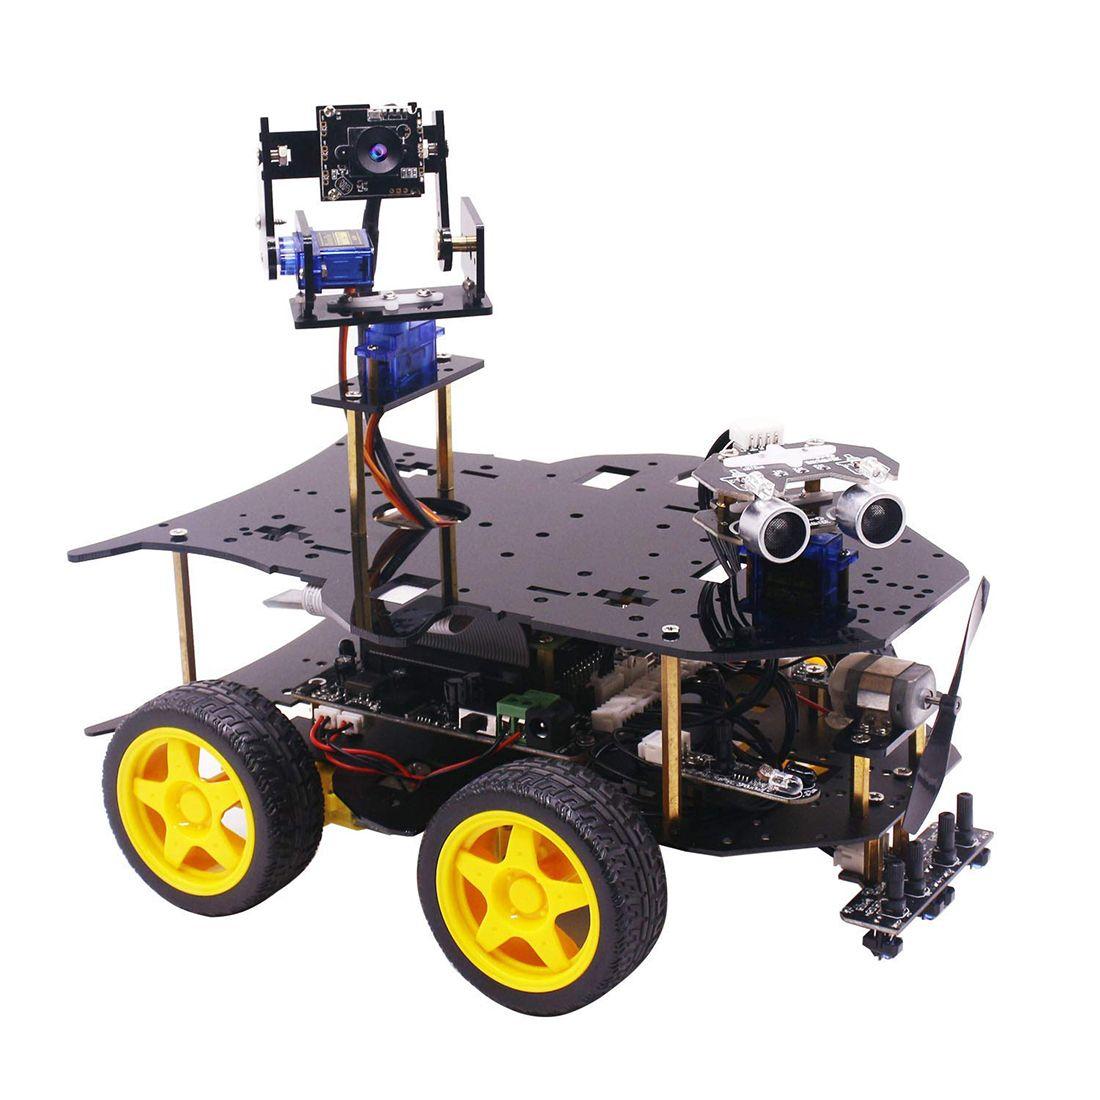 Ultimative Starter Kit für Raspberry Pi 3 B + HD Kamera Programmierbare Smart Roboter Auto Kit Modell Baustein Dampf stem Spielzeug Kit